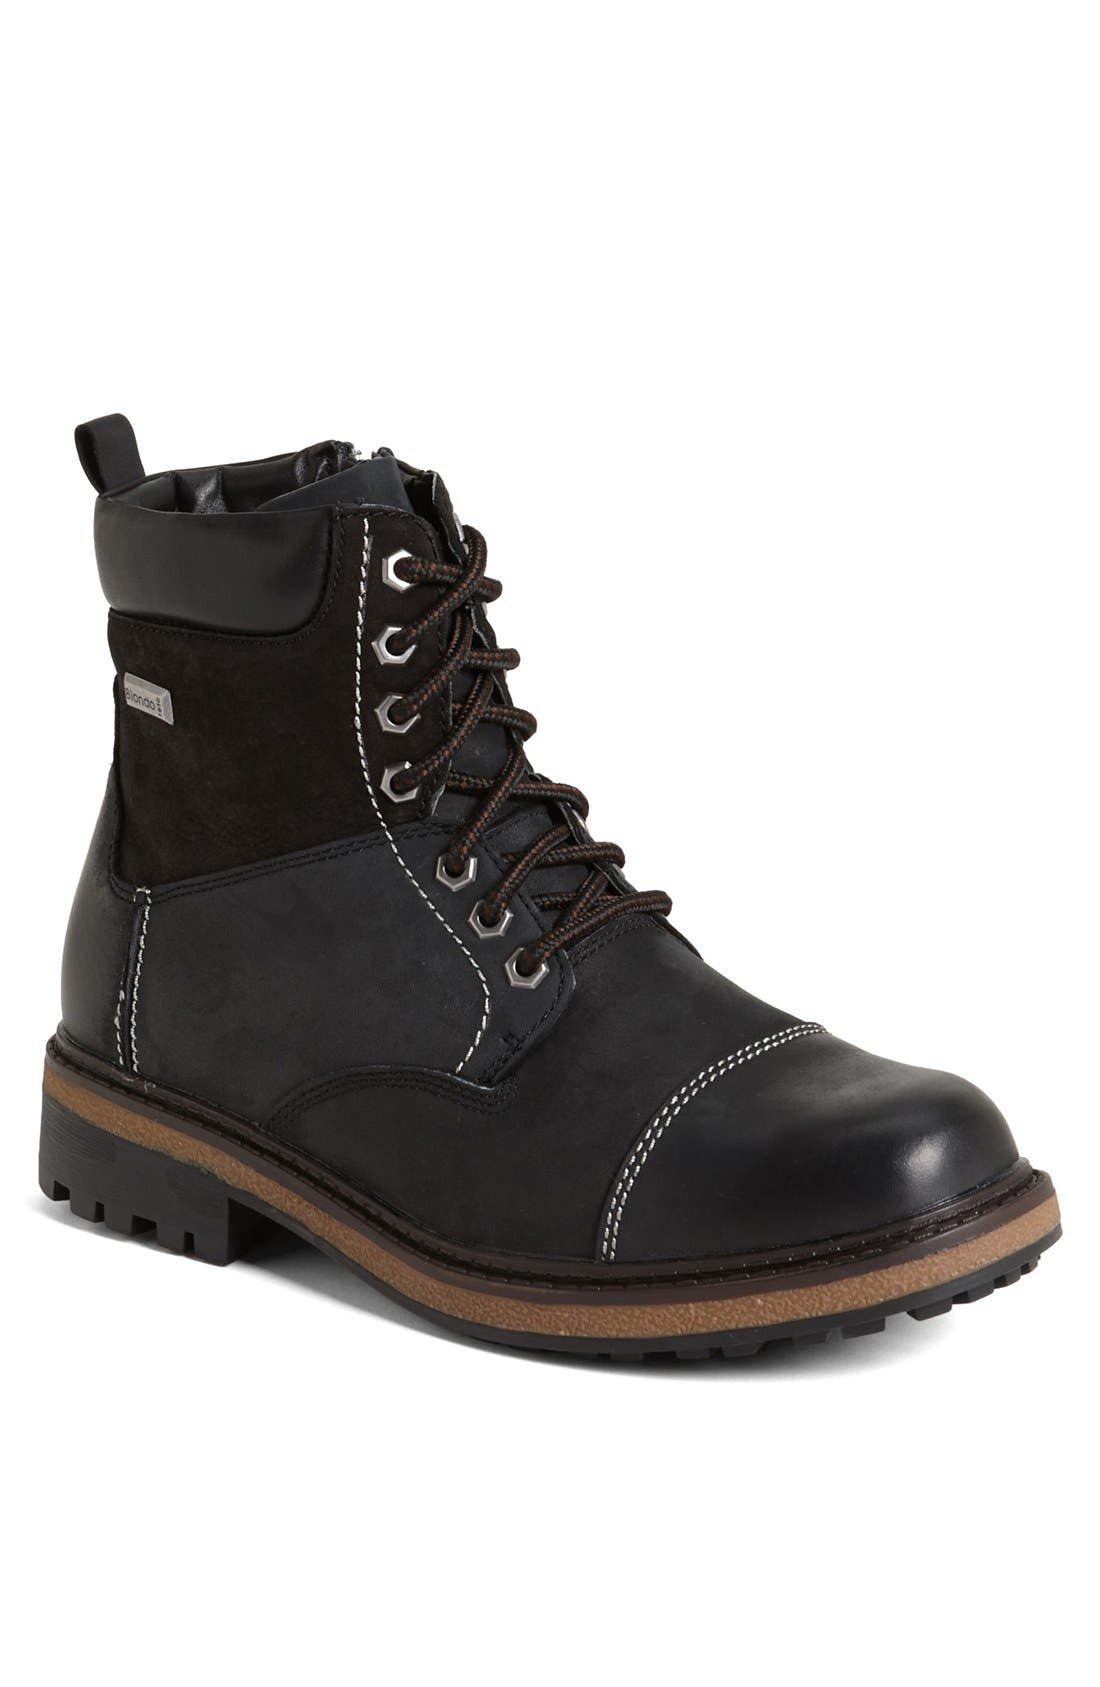 Alternate Image 1 Selected - Blondo 'Jaro' Waterproof Boot (Men)